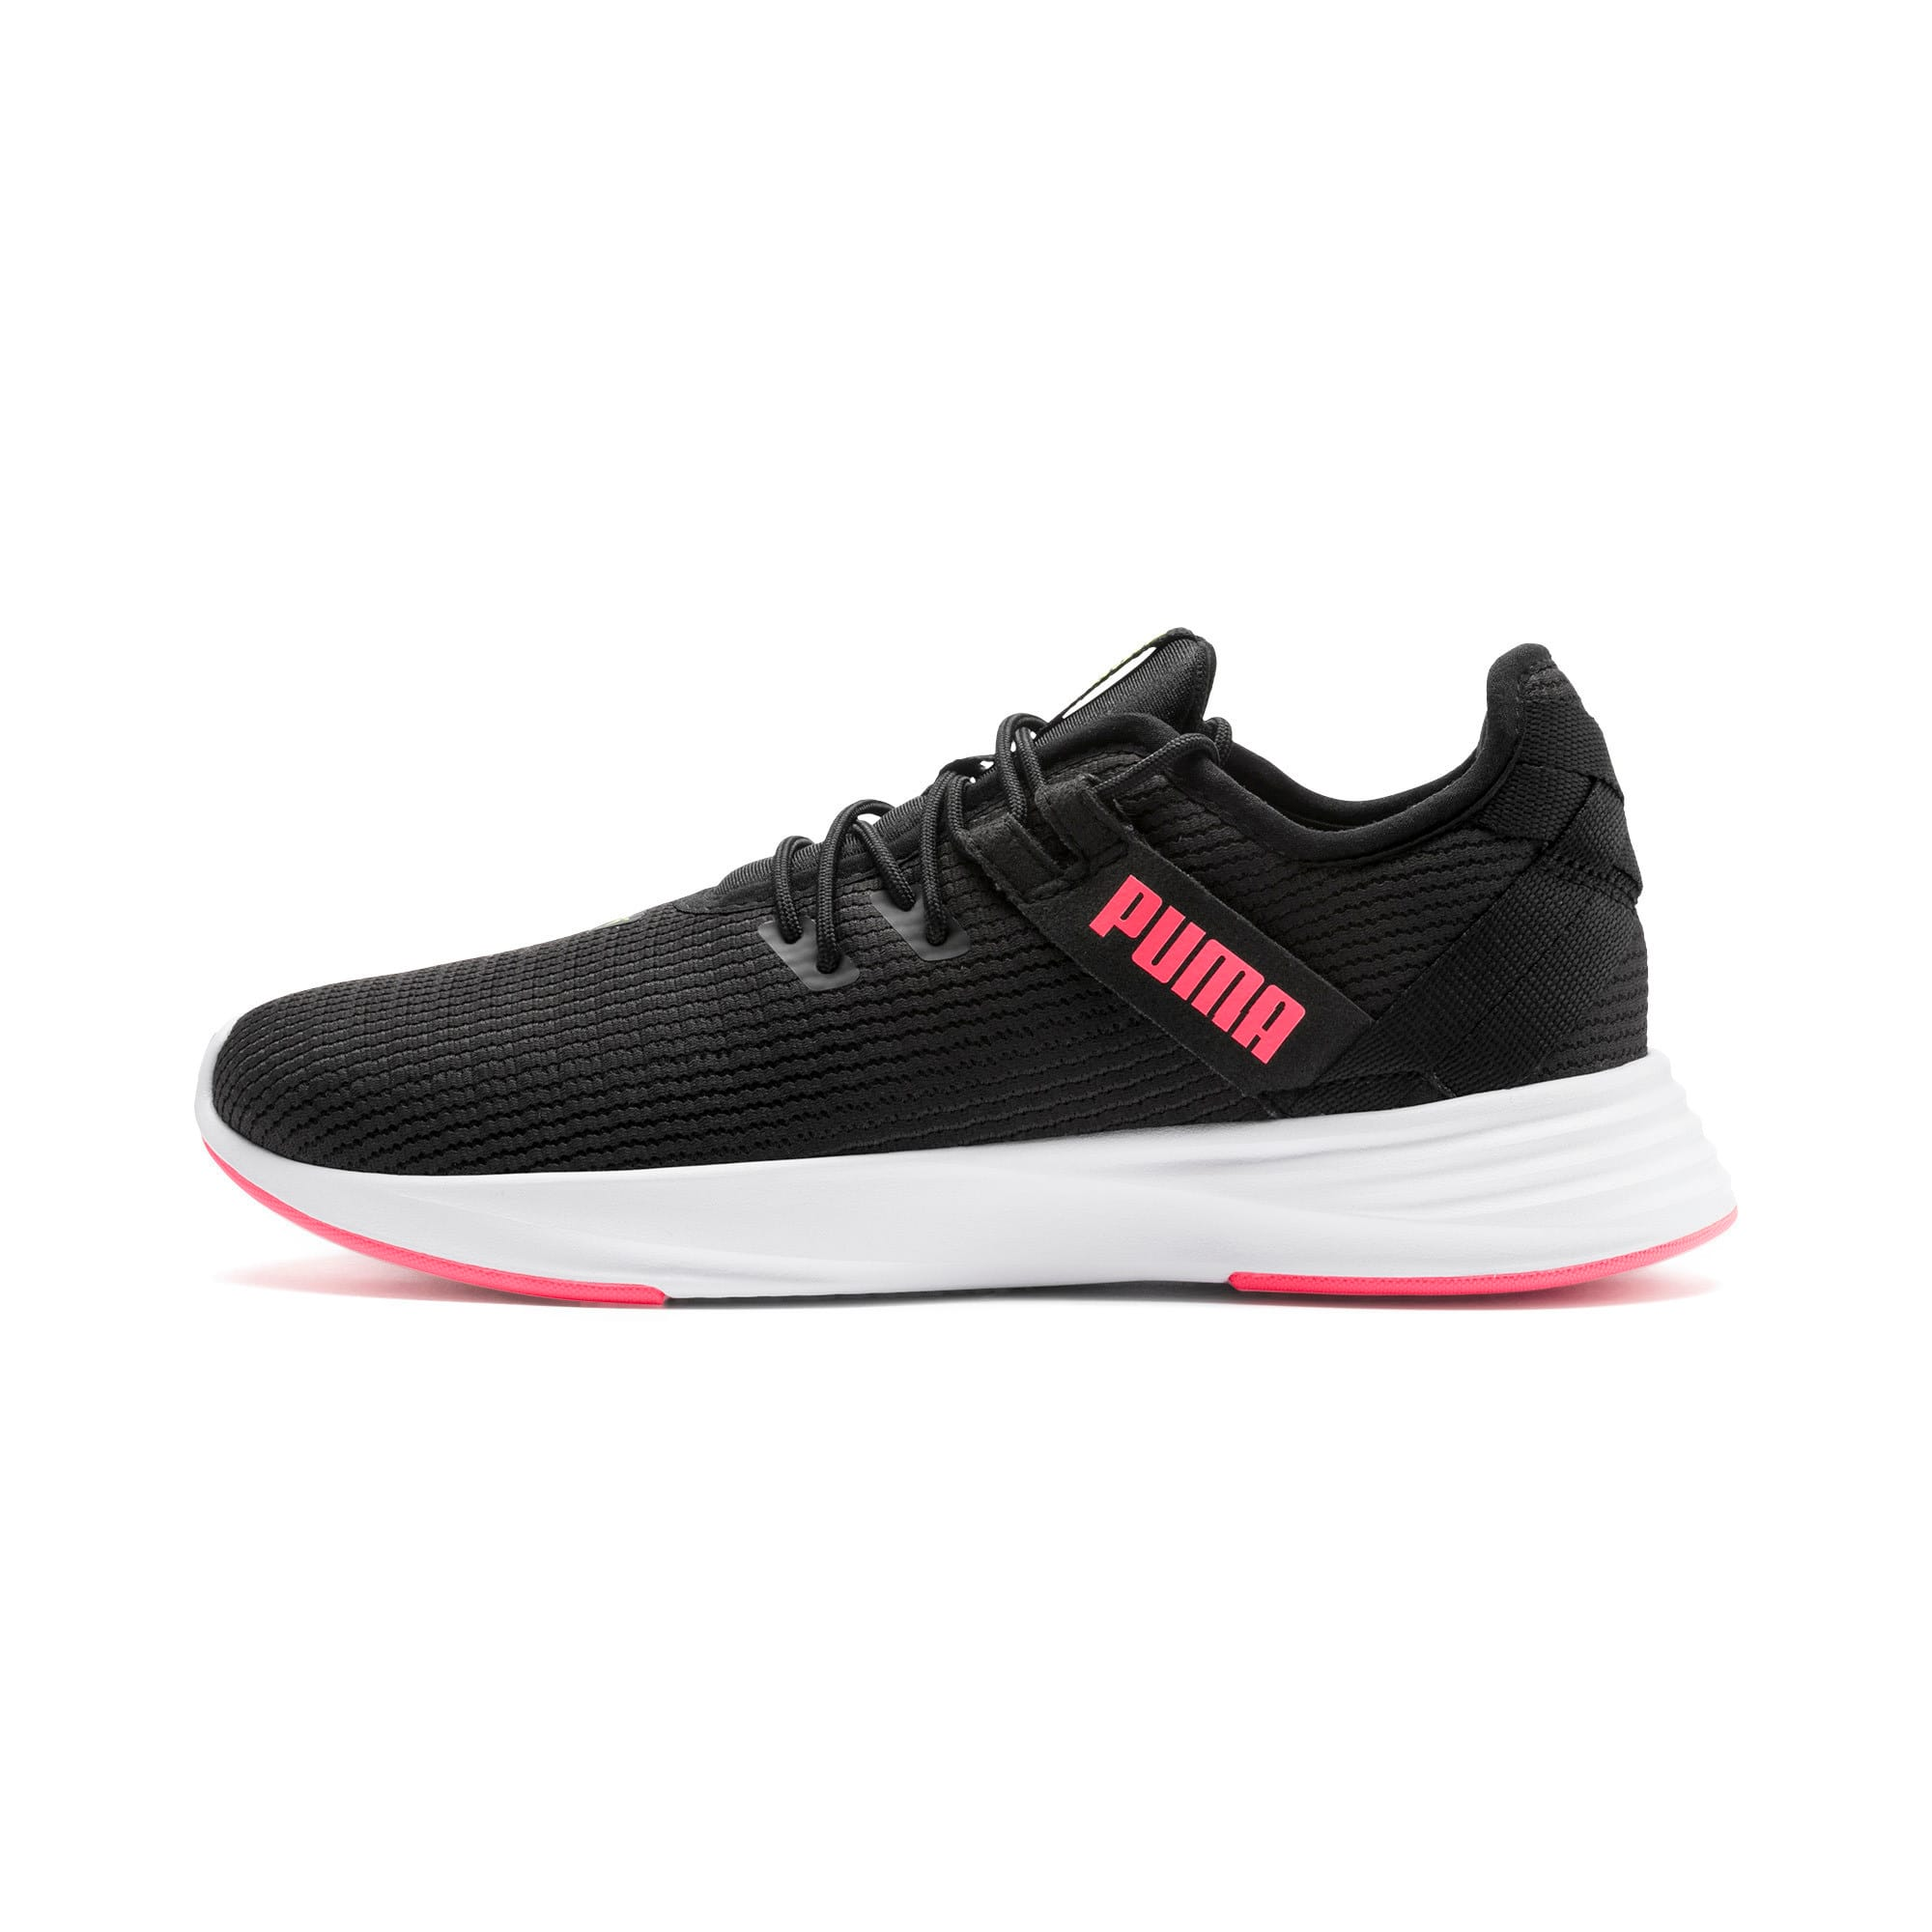 Thumbnail 1 of Radiate XT Women's Training Shoes, Puma Black-Pink Alert, medium